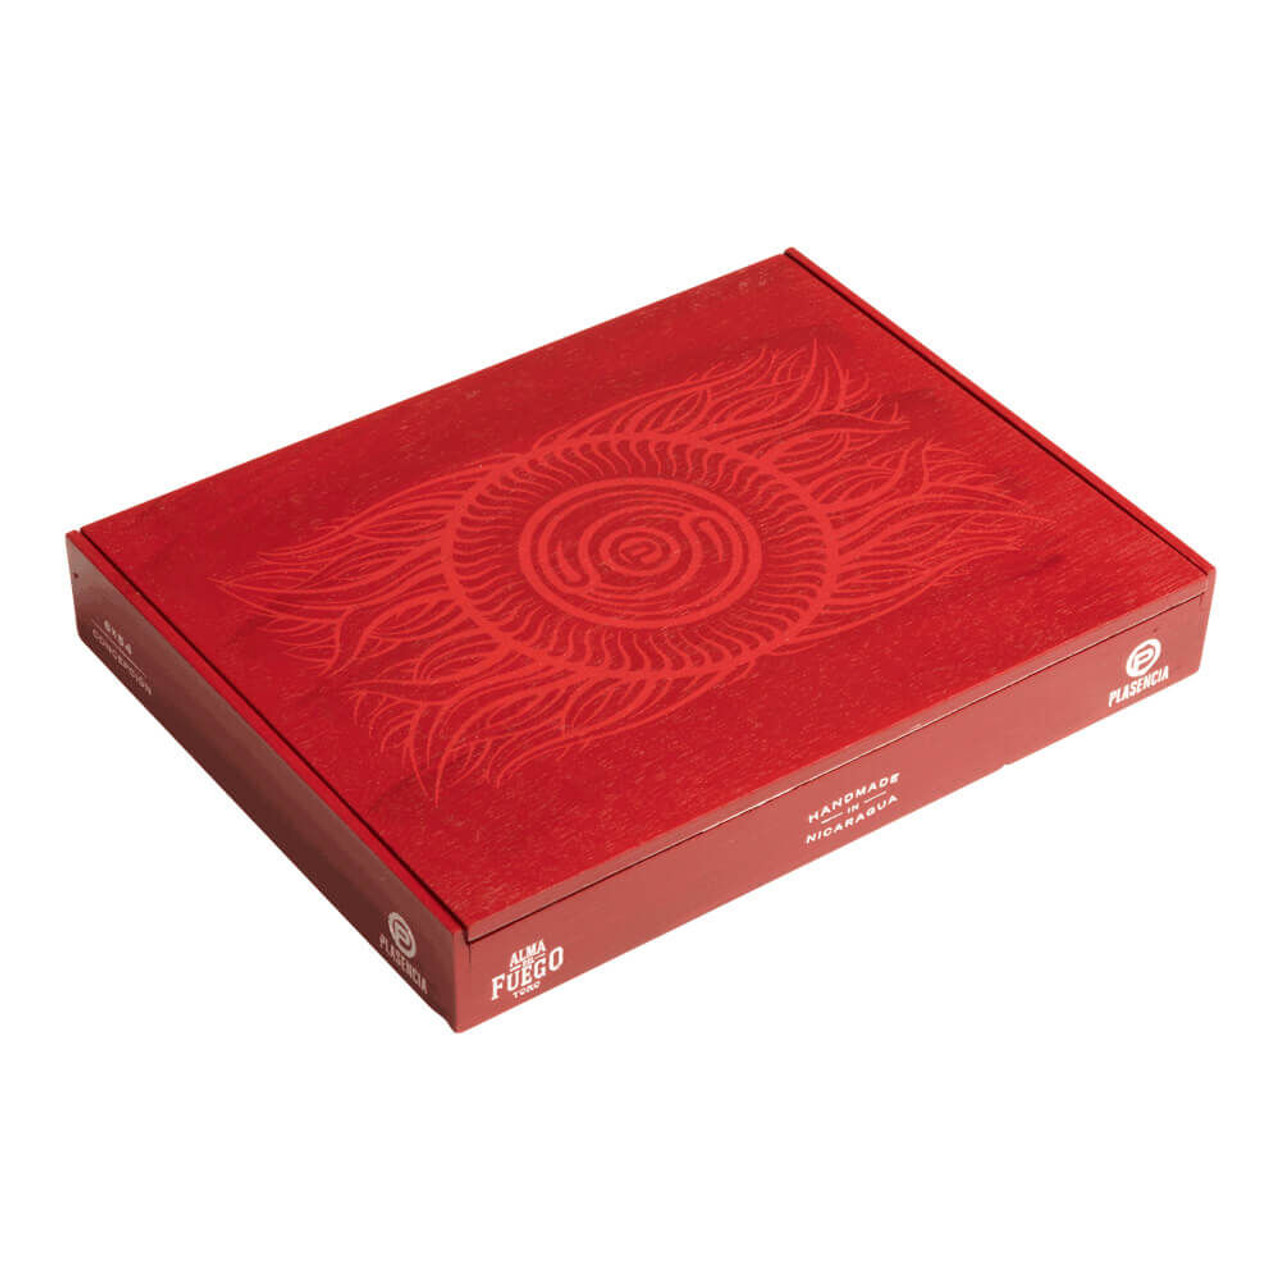 Plasencia Alma Del Fuego Concepcion Toro Cigars - 6 x 54 (Box of 10)